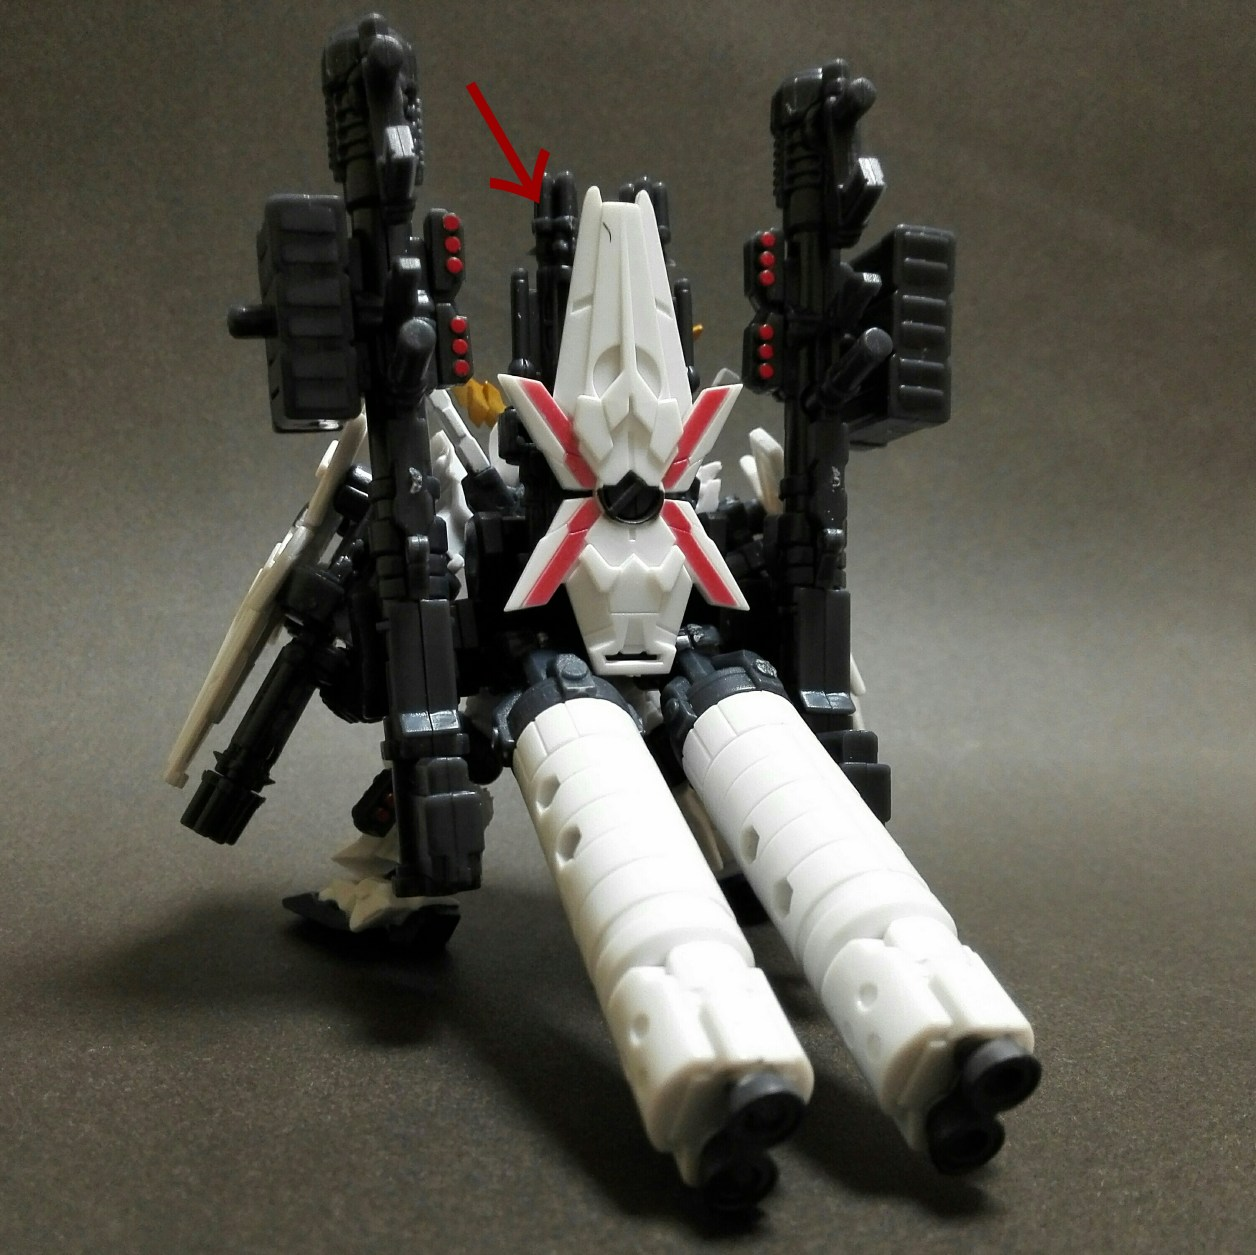 mobile suit ensemble ex13 フルアーマー・ユニコーン[RED.ver]のフルアーマー・ユニコーンガンダムの組立方法の画像